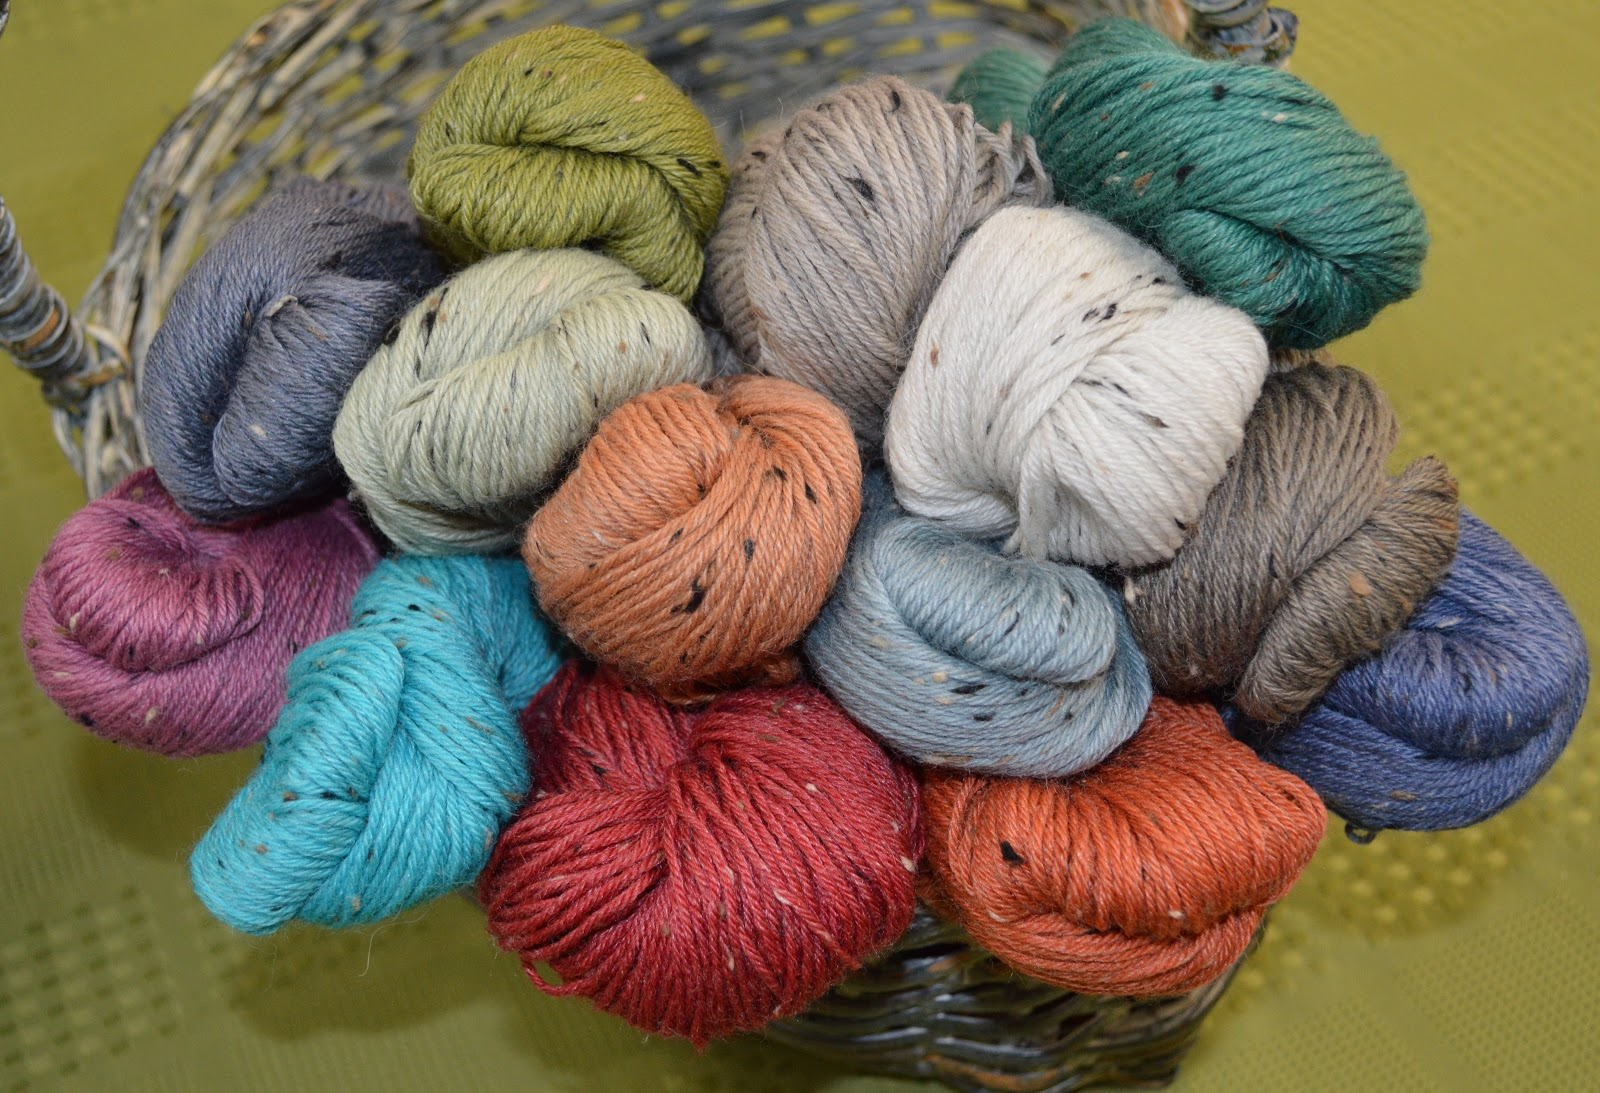 Crochet Patterns With Fine Yarn : Tangled Purls, fine yarn studio: New Yarn!